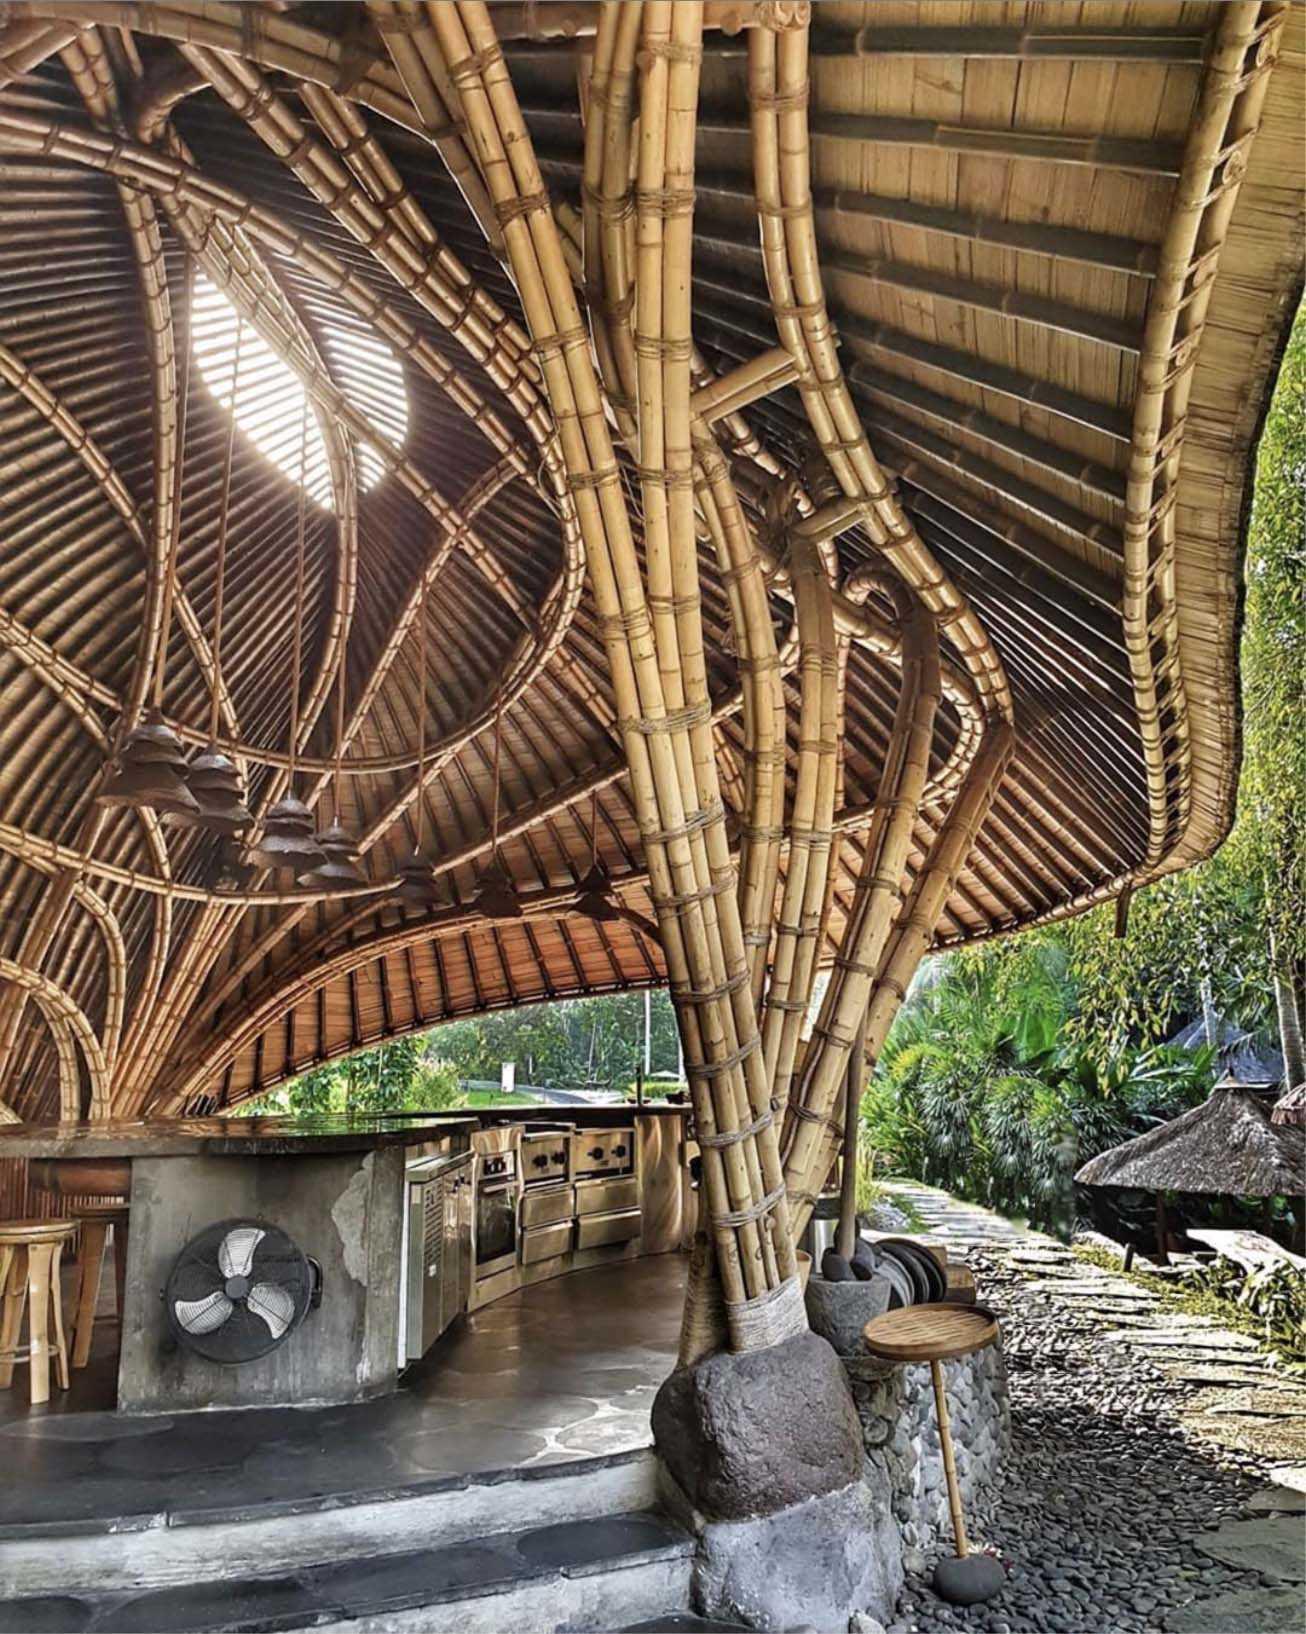 Agung Budi Raharsa | Architecture & Engineering Sokasi Bamboo Cooking Class / School - Bali Bali, Indonesia Bali, Indonesia Agung-Budi-Raharsa-Sokasi-Cooking-Class-School-Bali   88751